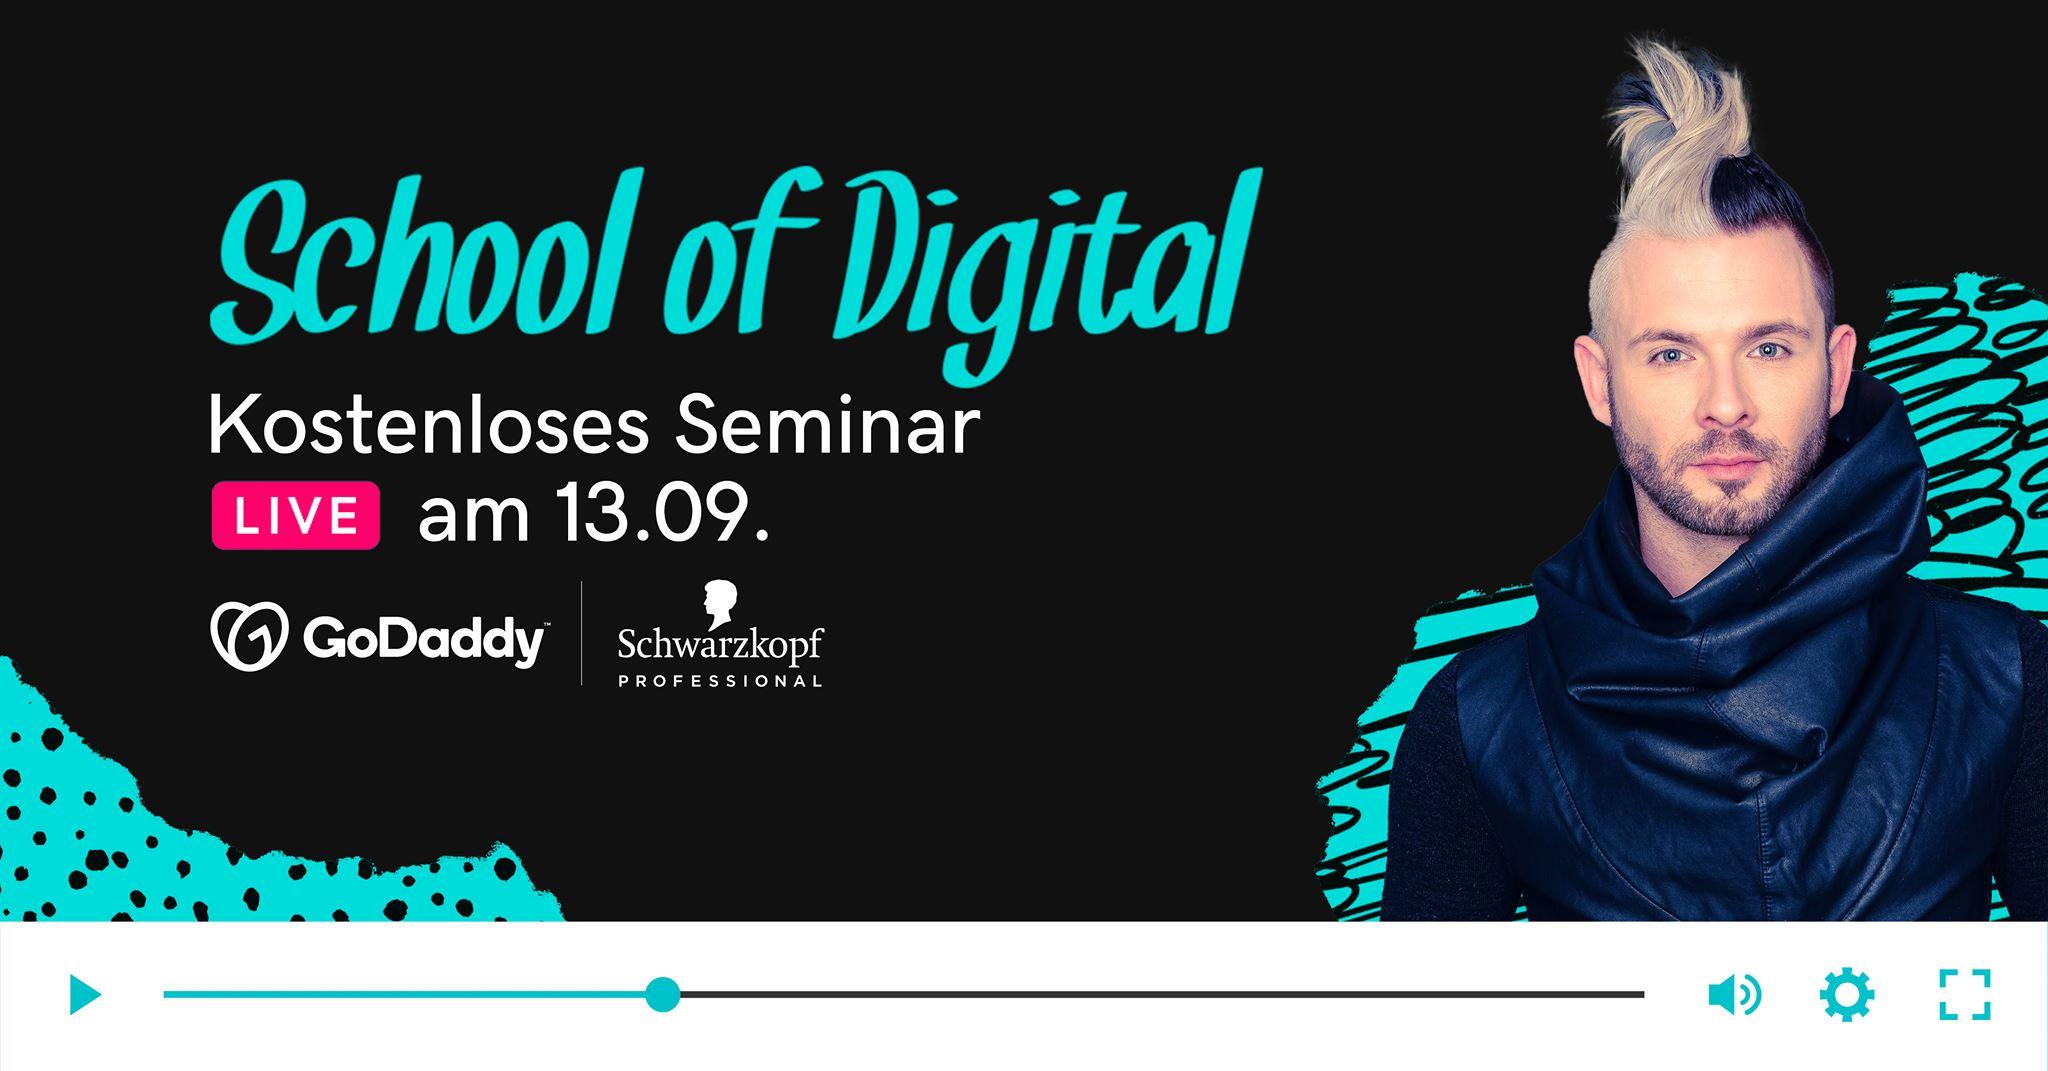 Schwarzkopf_GoDaddy_School of Digital